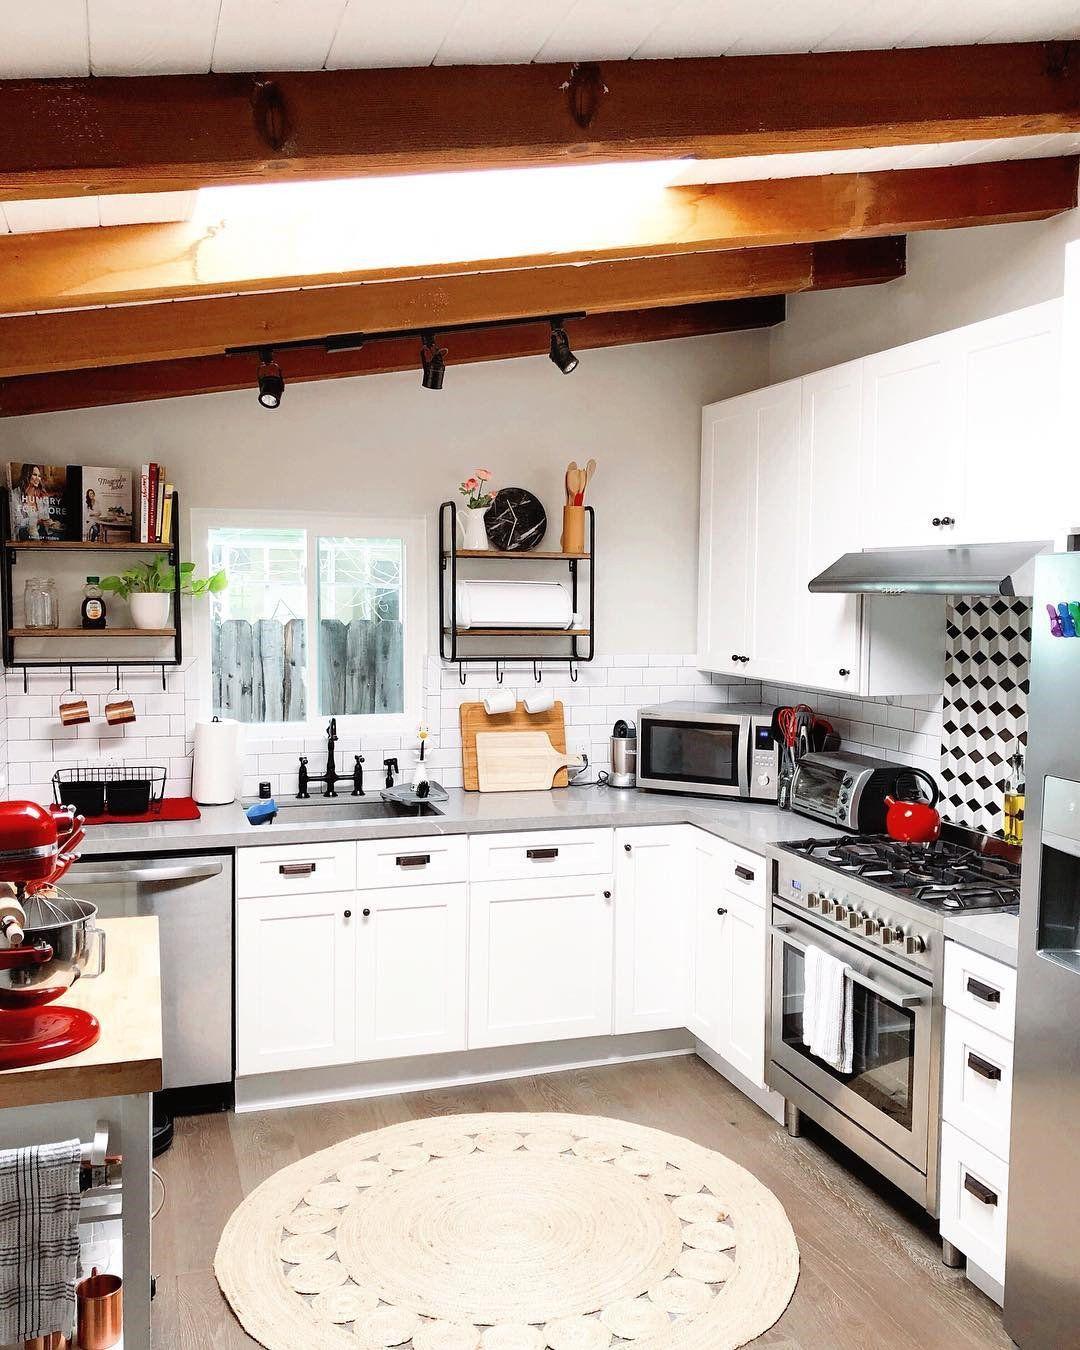 28 Small Kitchen Design Ideas: 60+ Small Kitchen Design Ideas To Make Your Home More